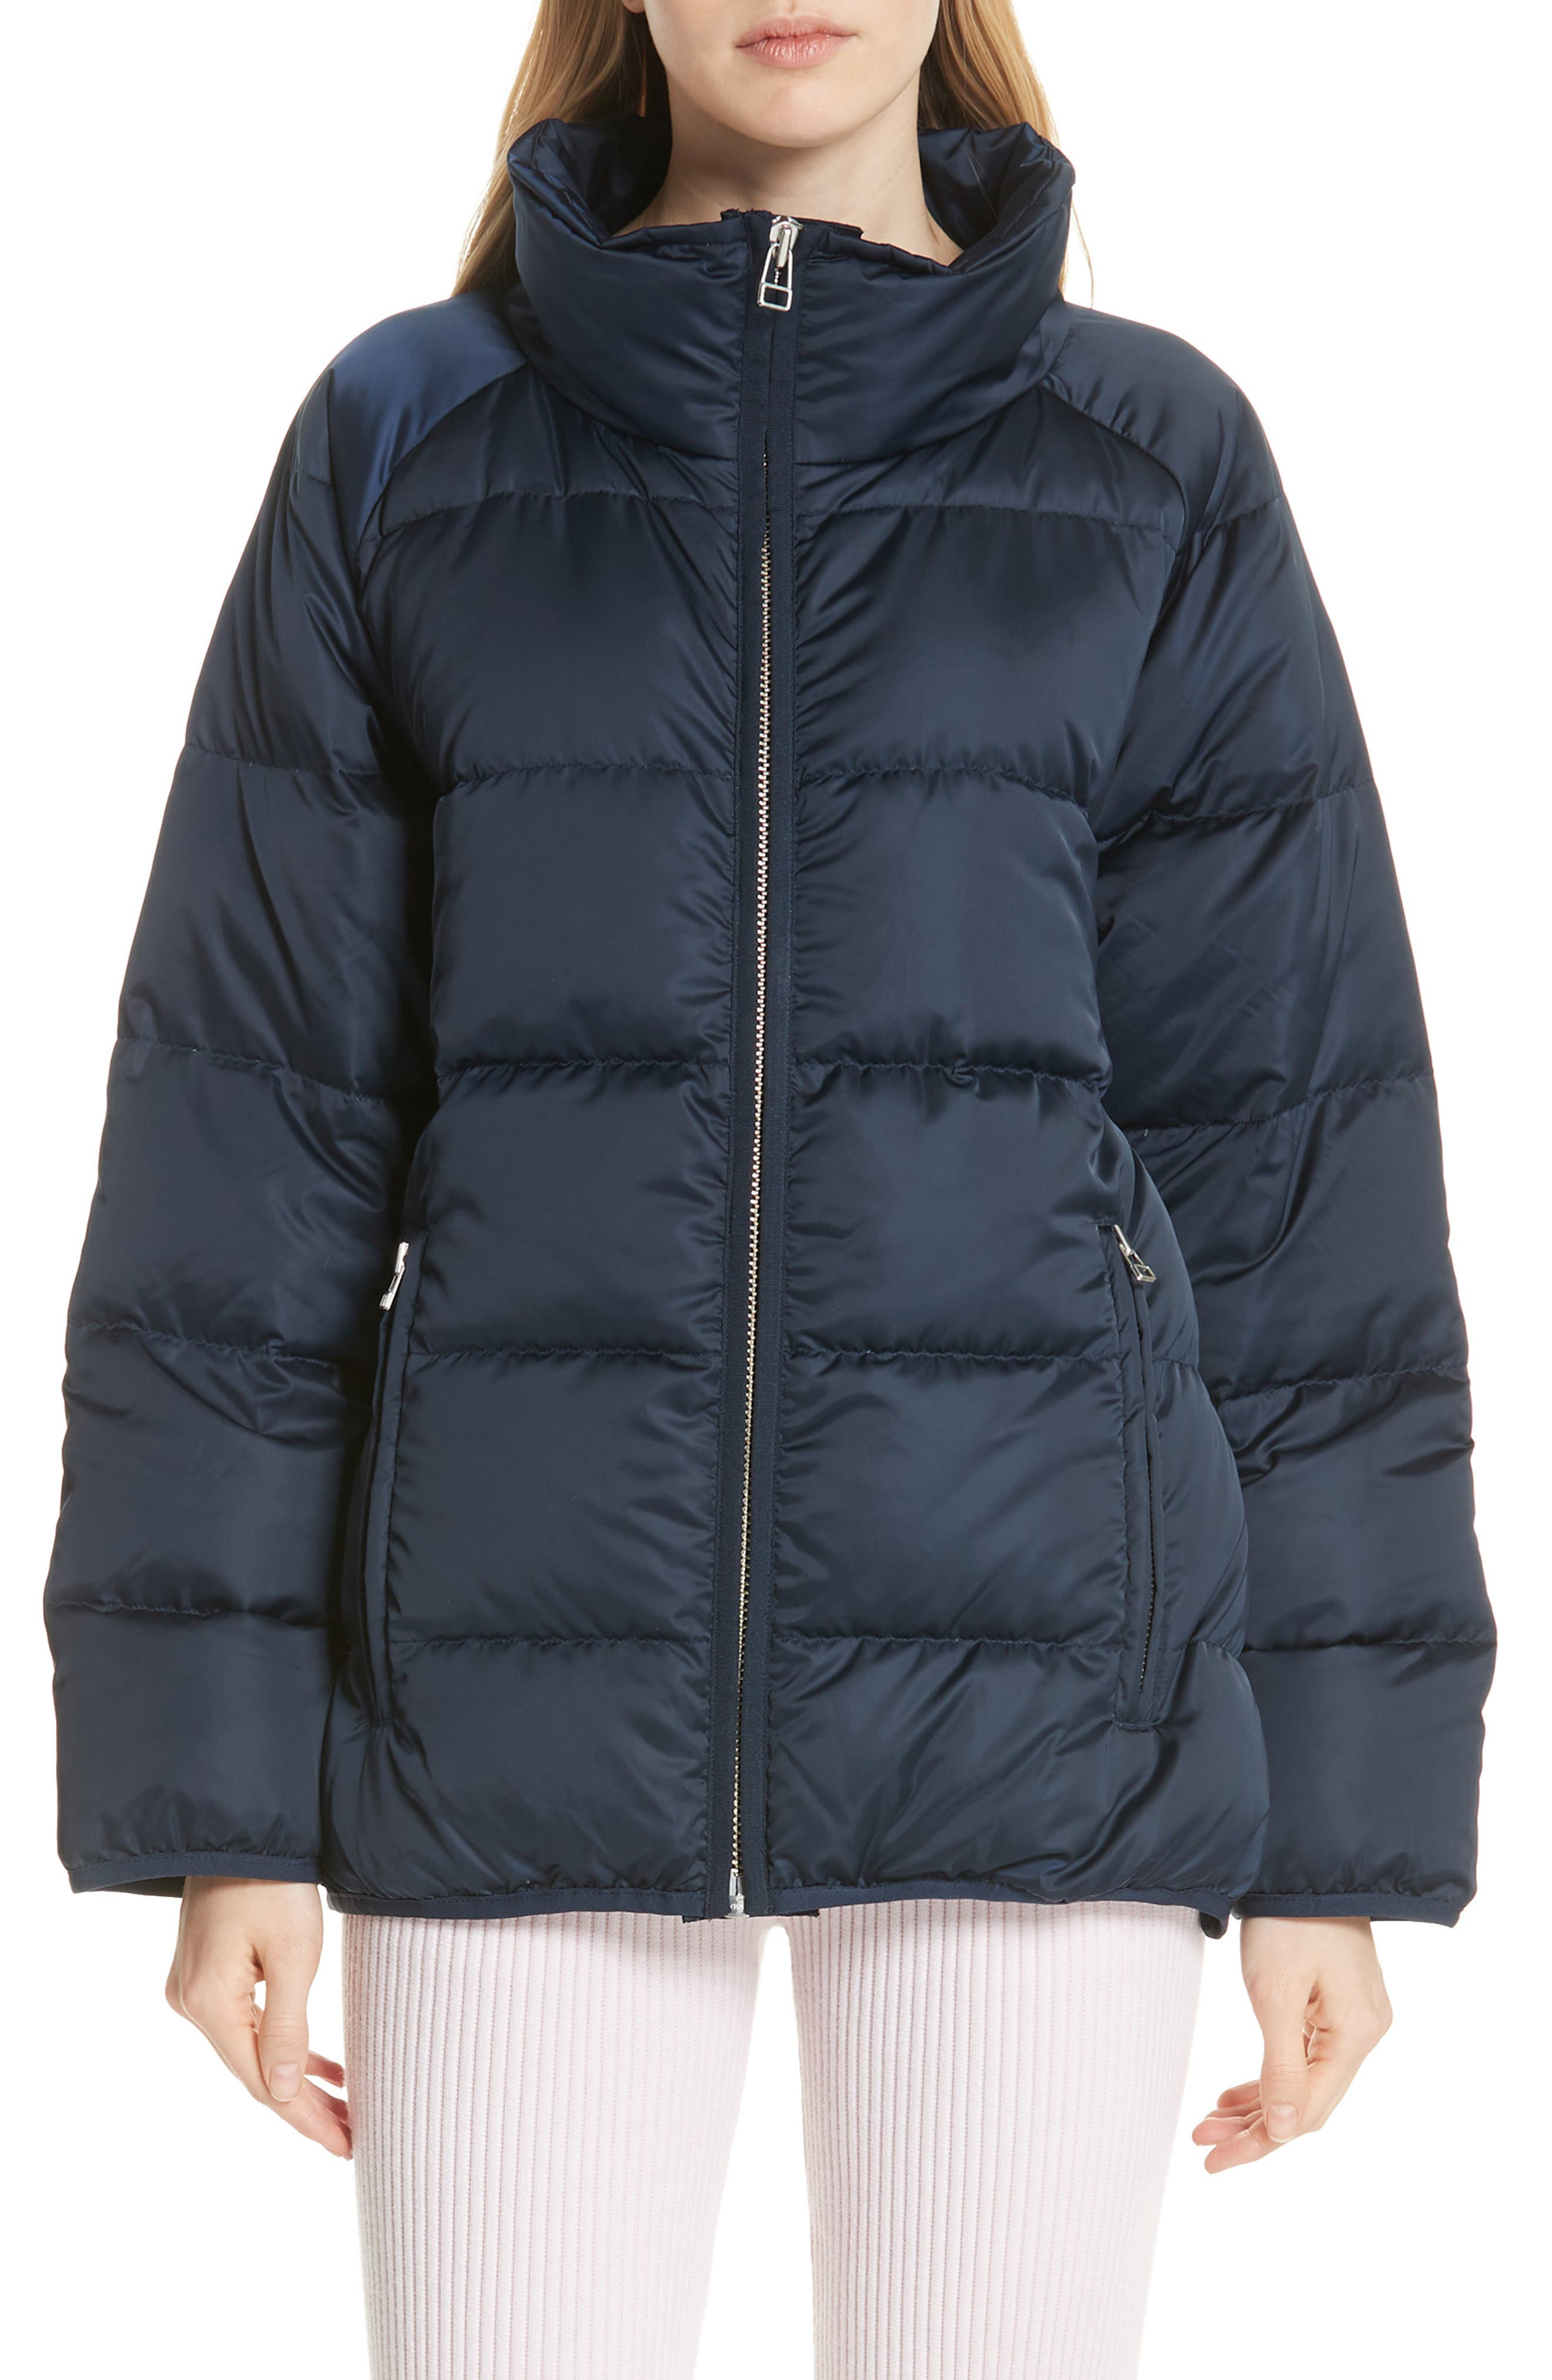 Satin Down Full-Zip Puffer Jacket in Tory Navy